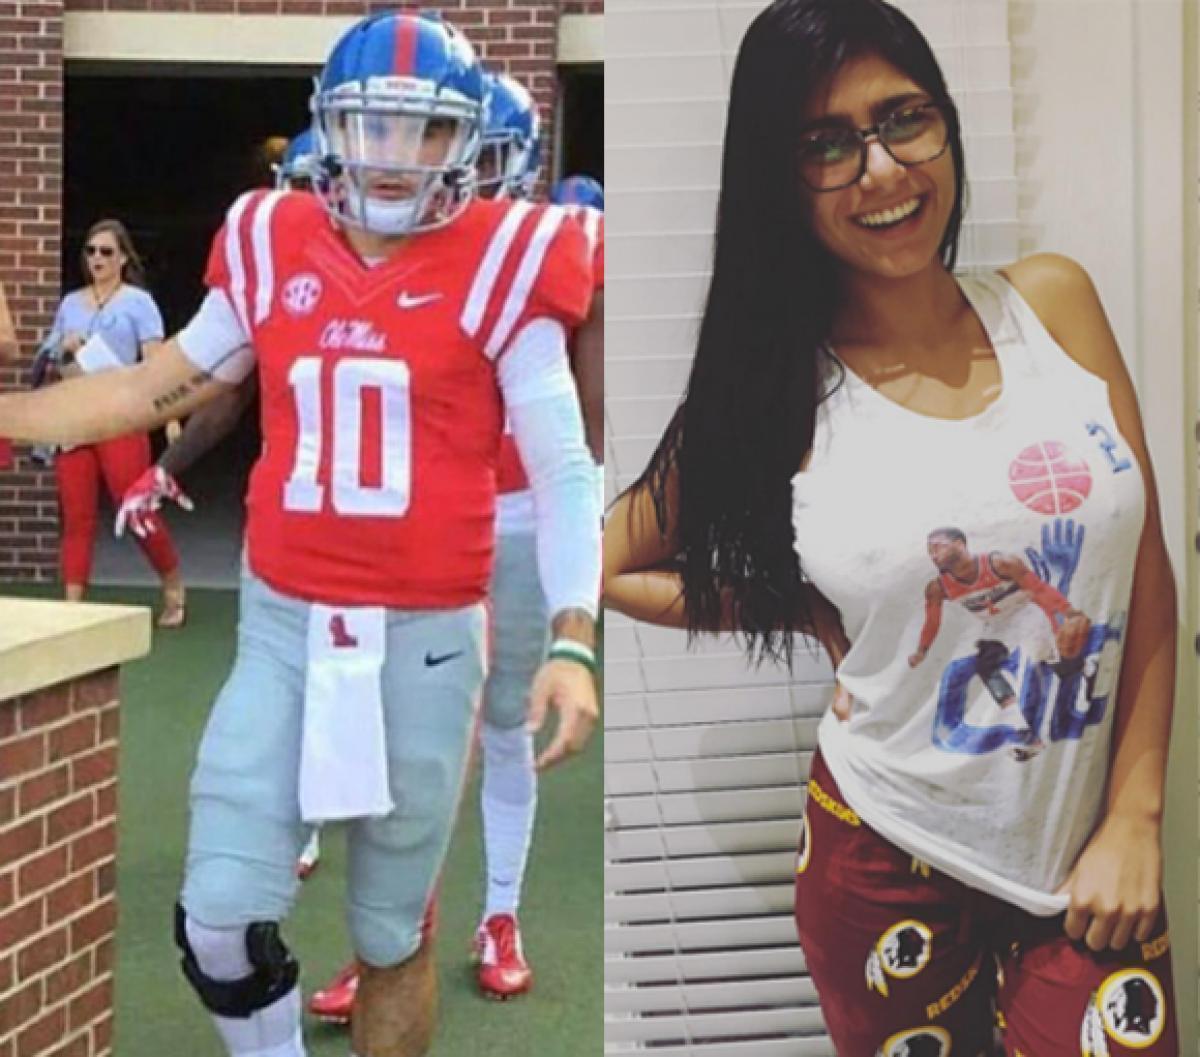 Hot C. recomended quarterback college